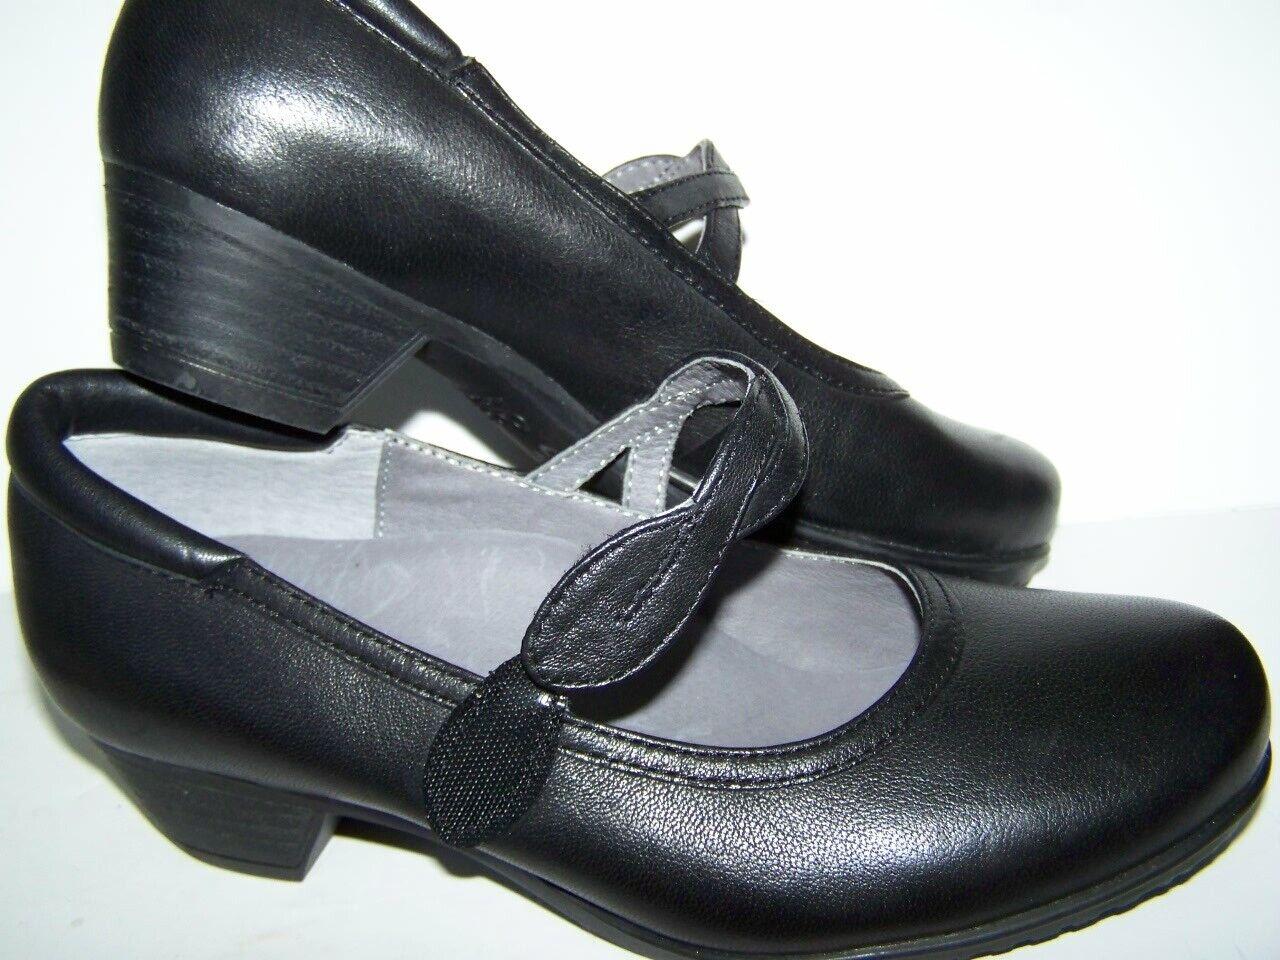 SALE New ABEO MARISOL Black Mary Jane Orthotic Shoes Women's 5N narrow wVelcro